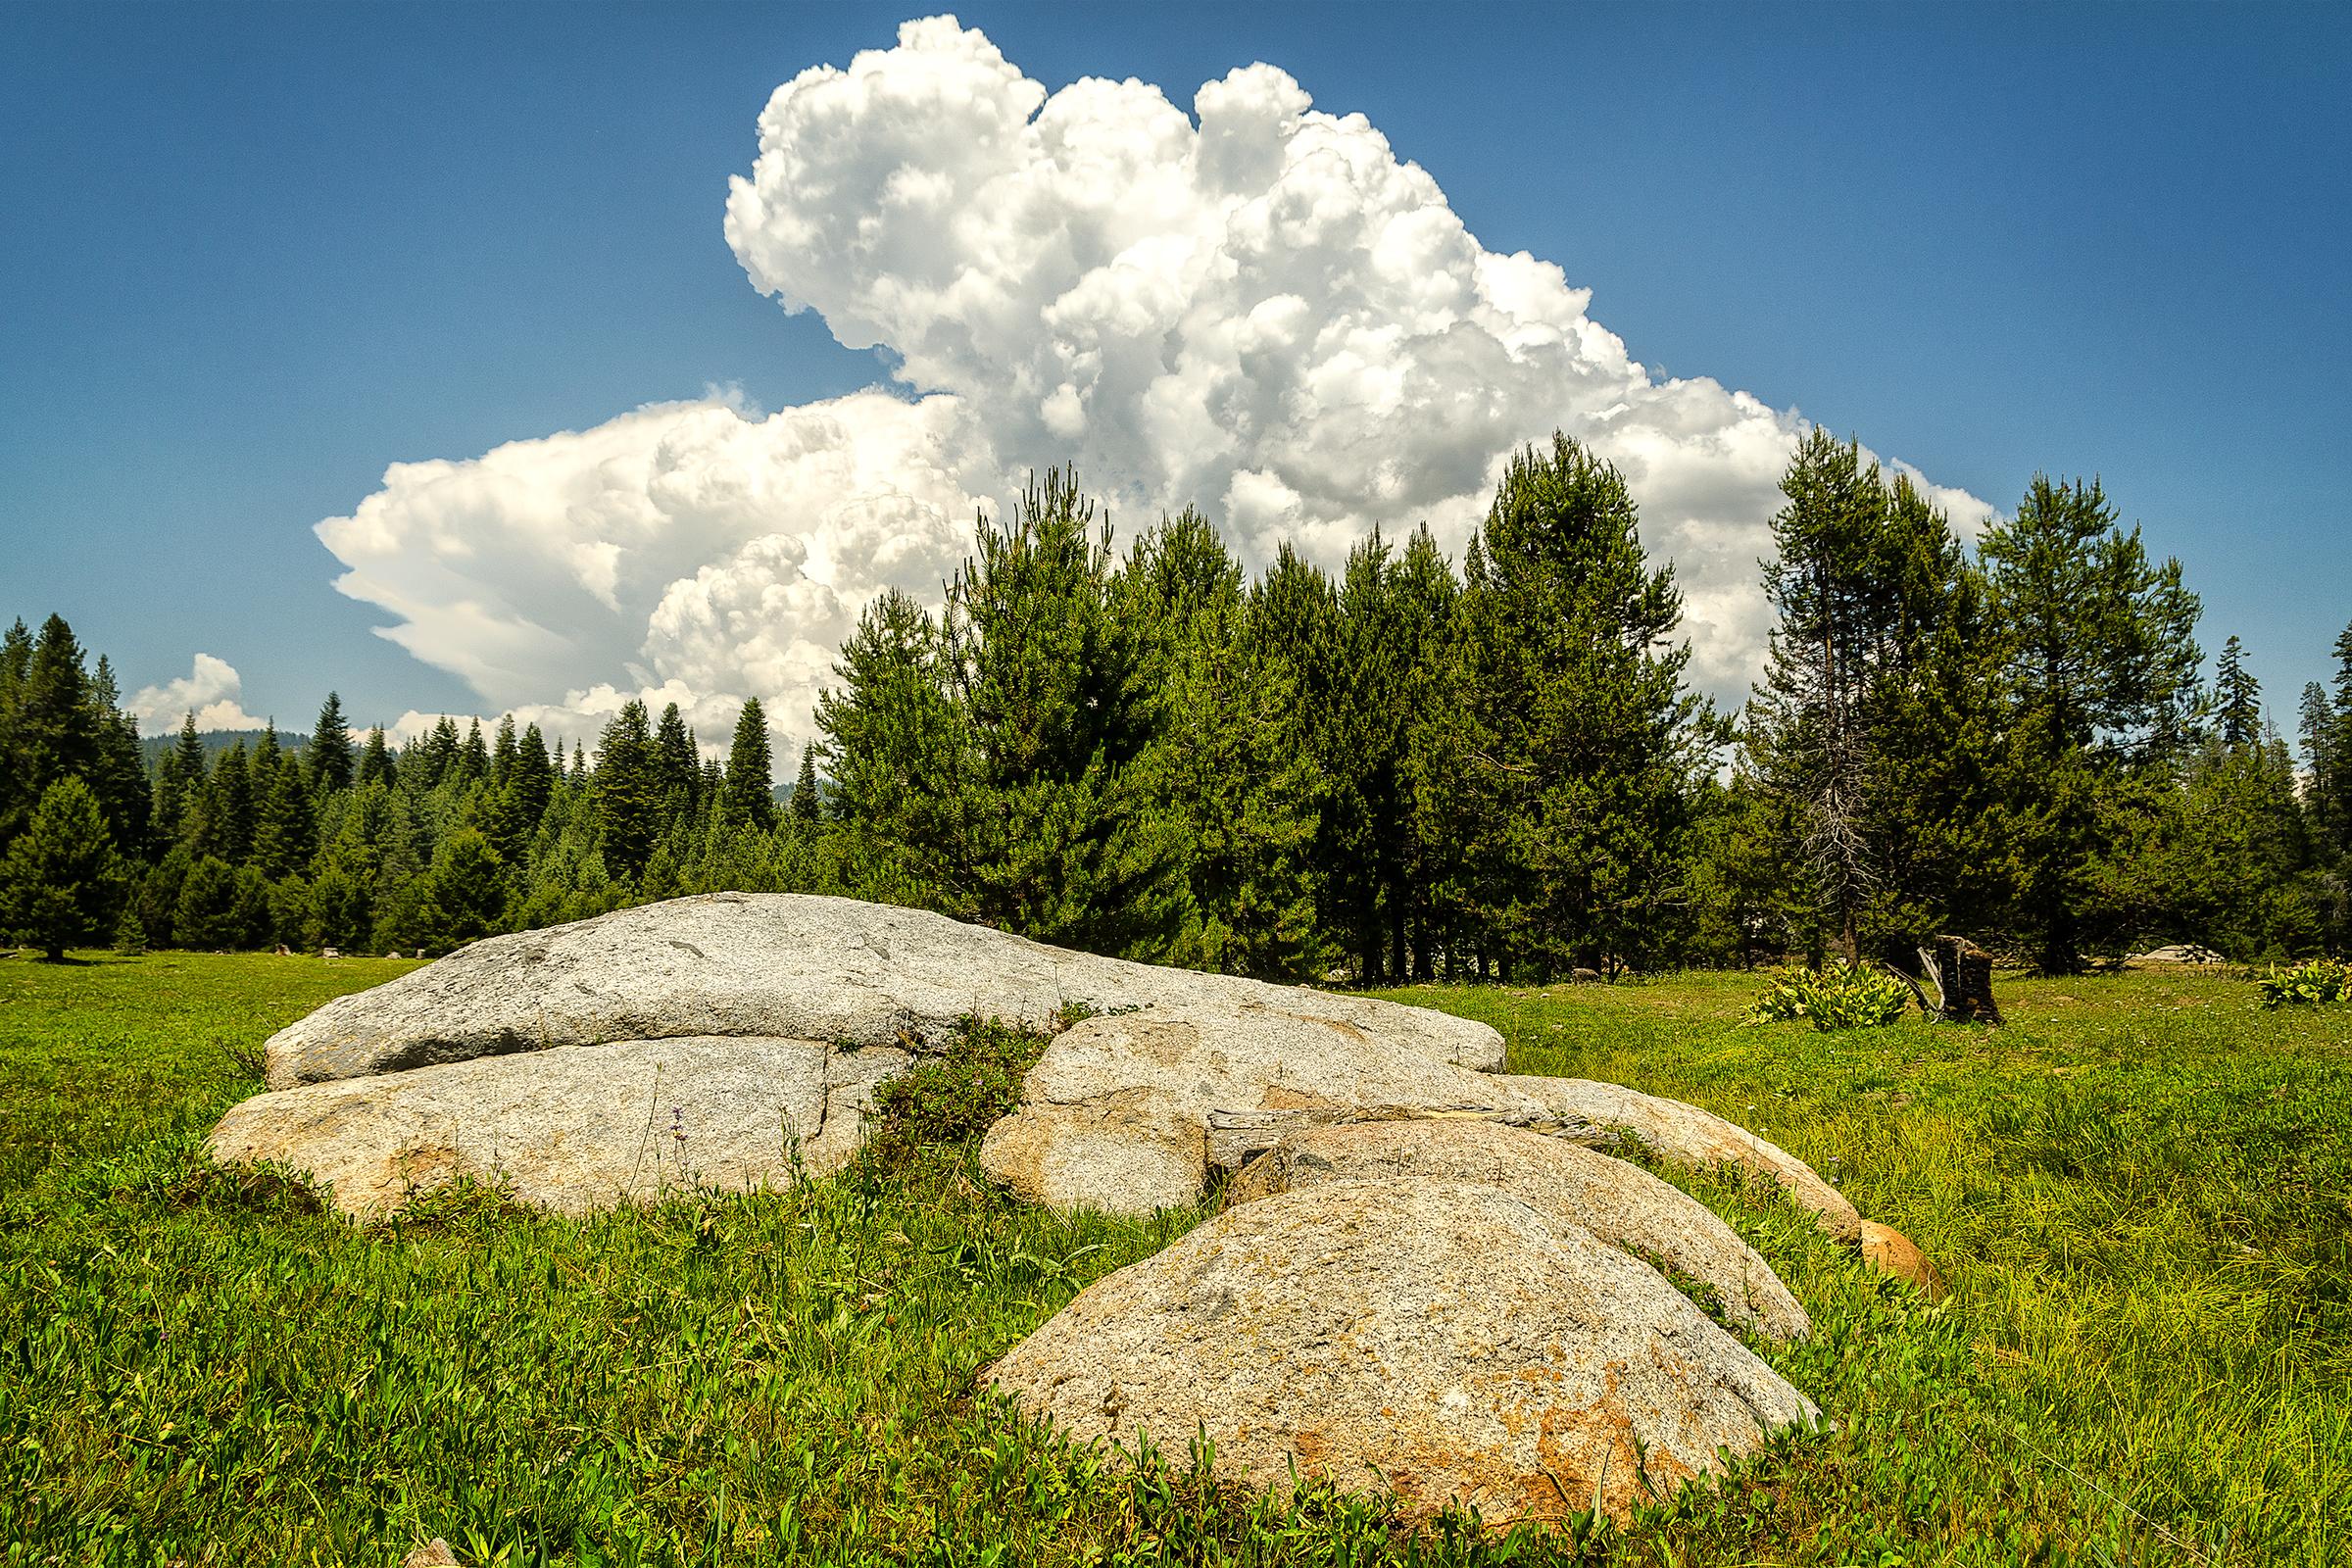 Yosemite National Forest, California. Wasim Muklashy Photography